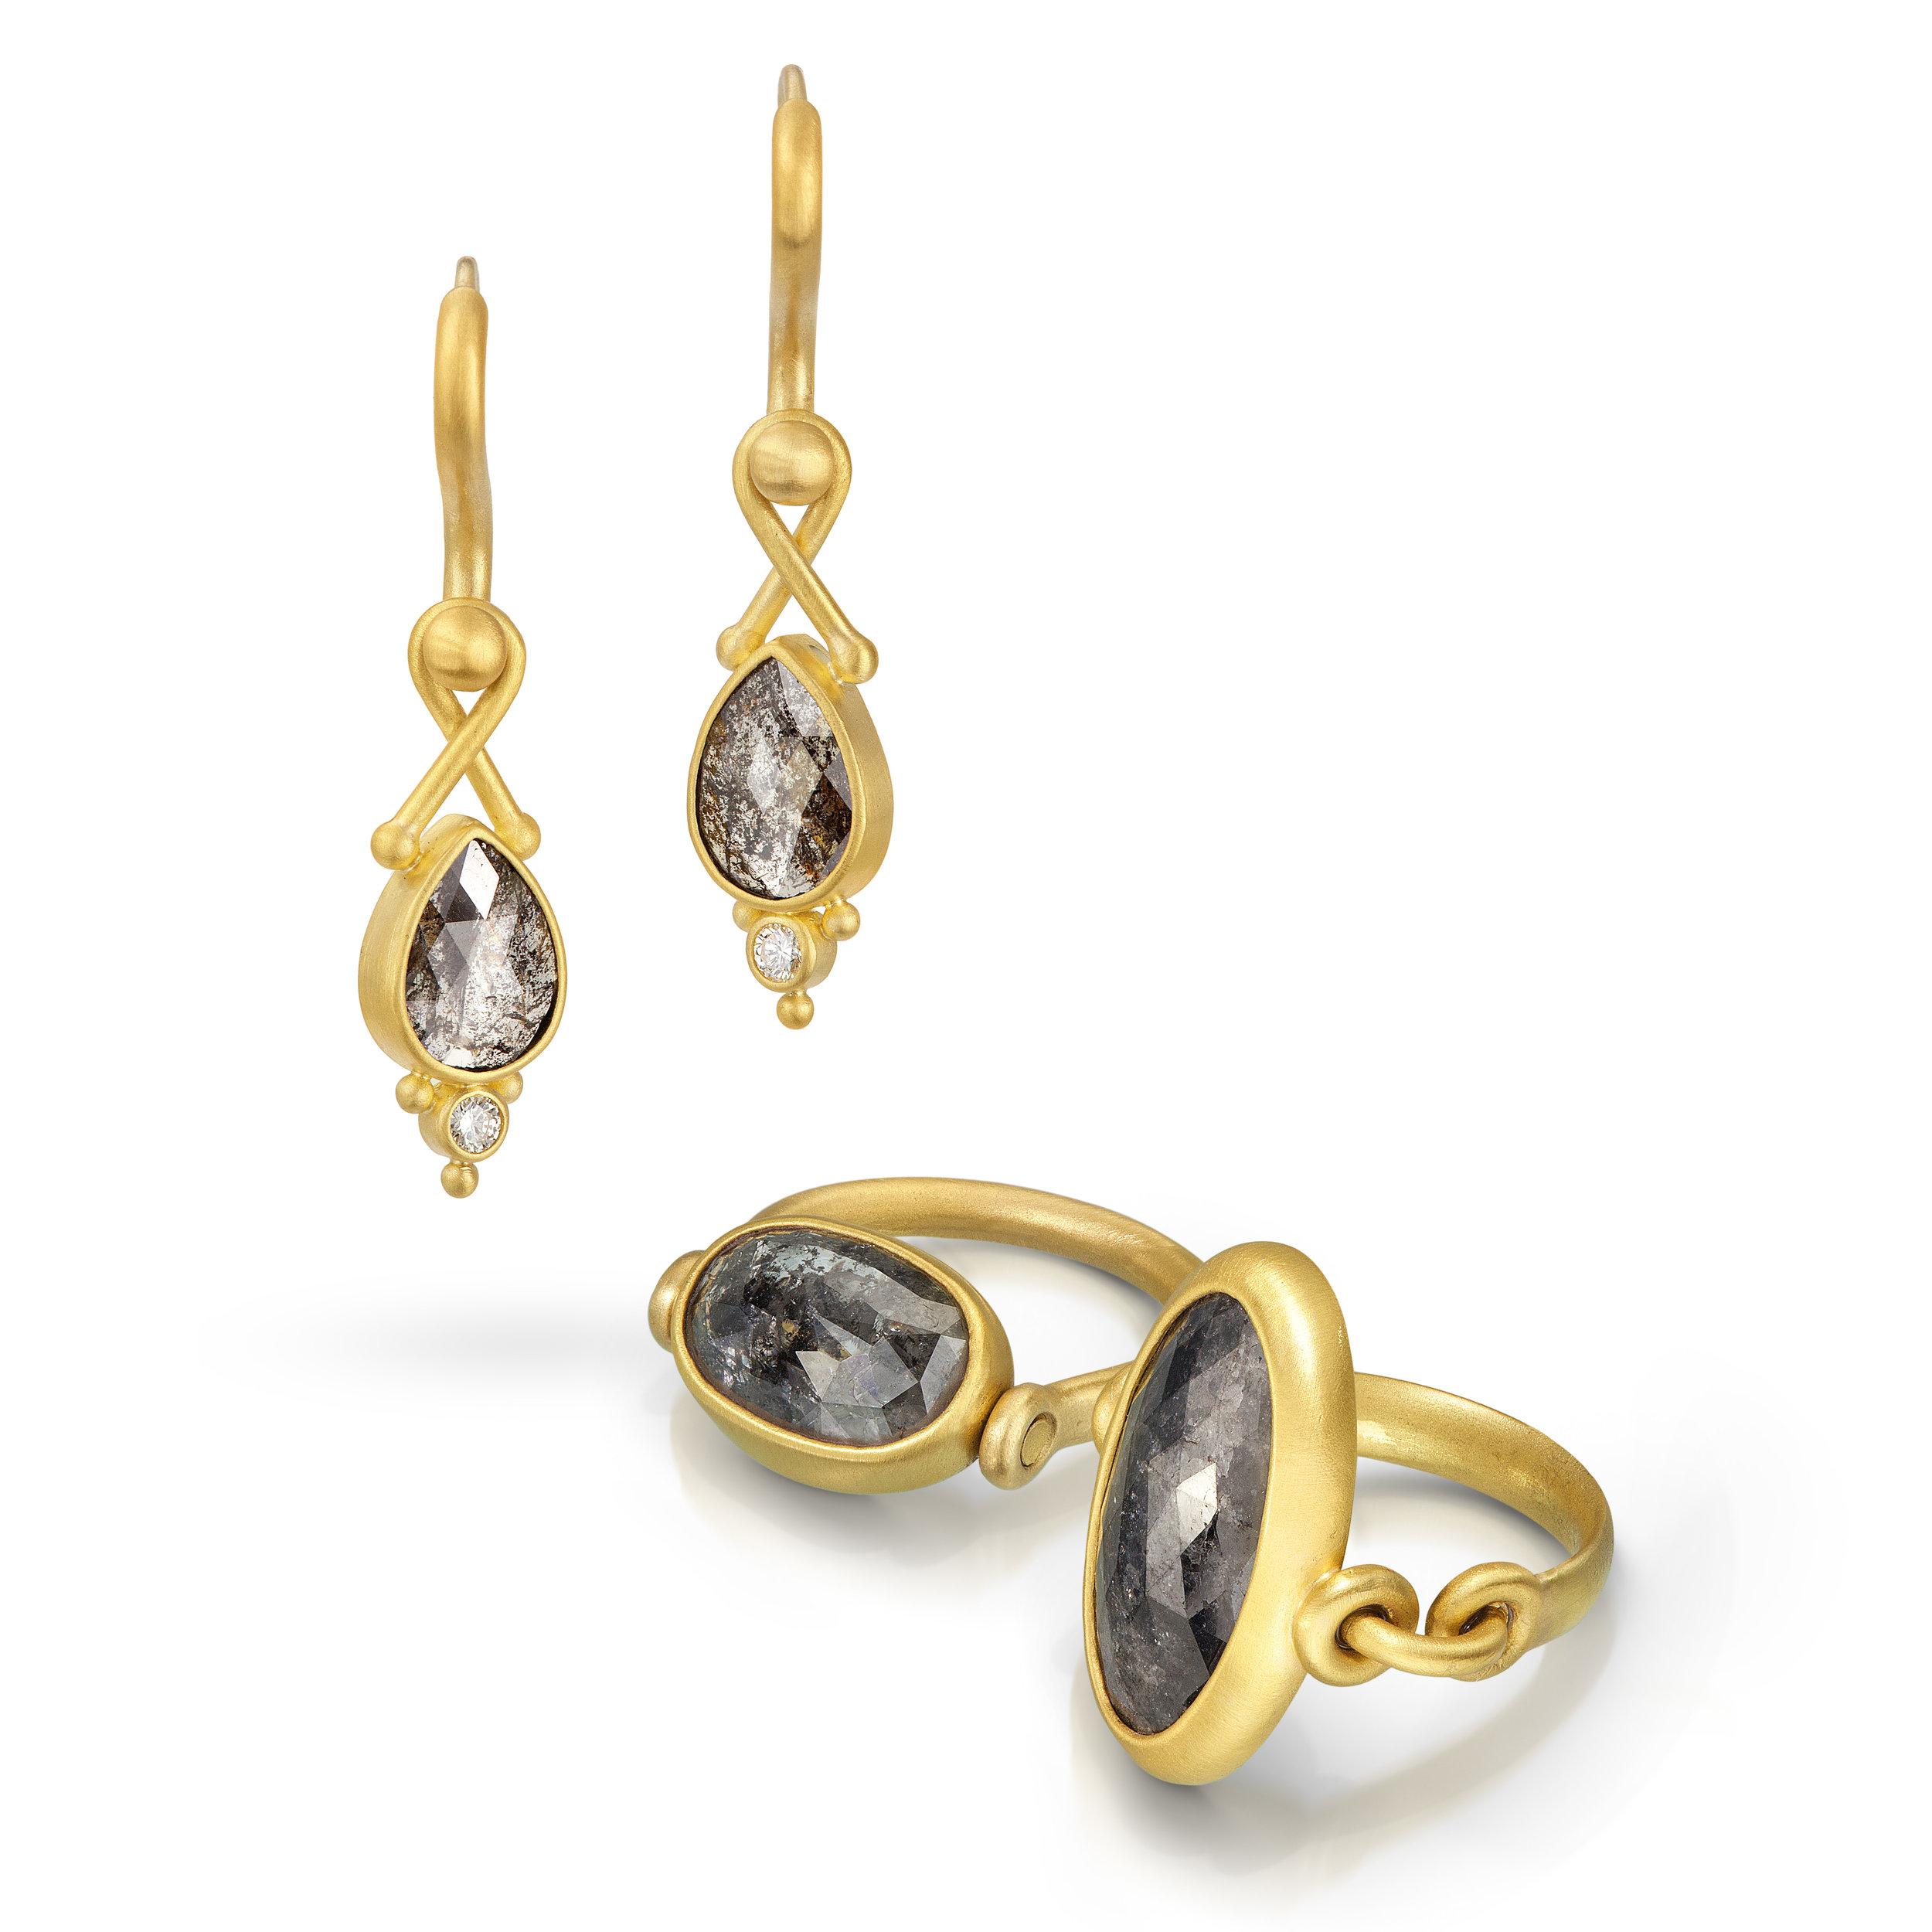 Denise Betesh earrings and rings